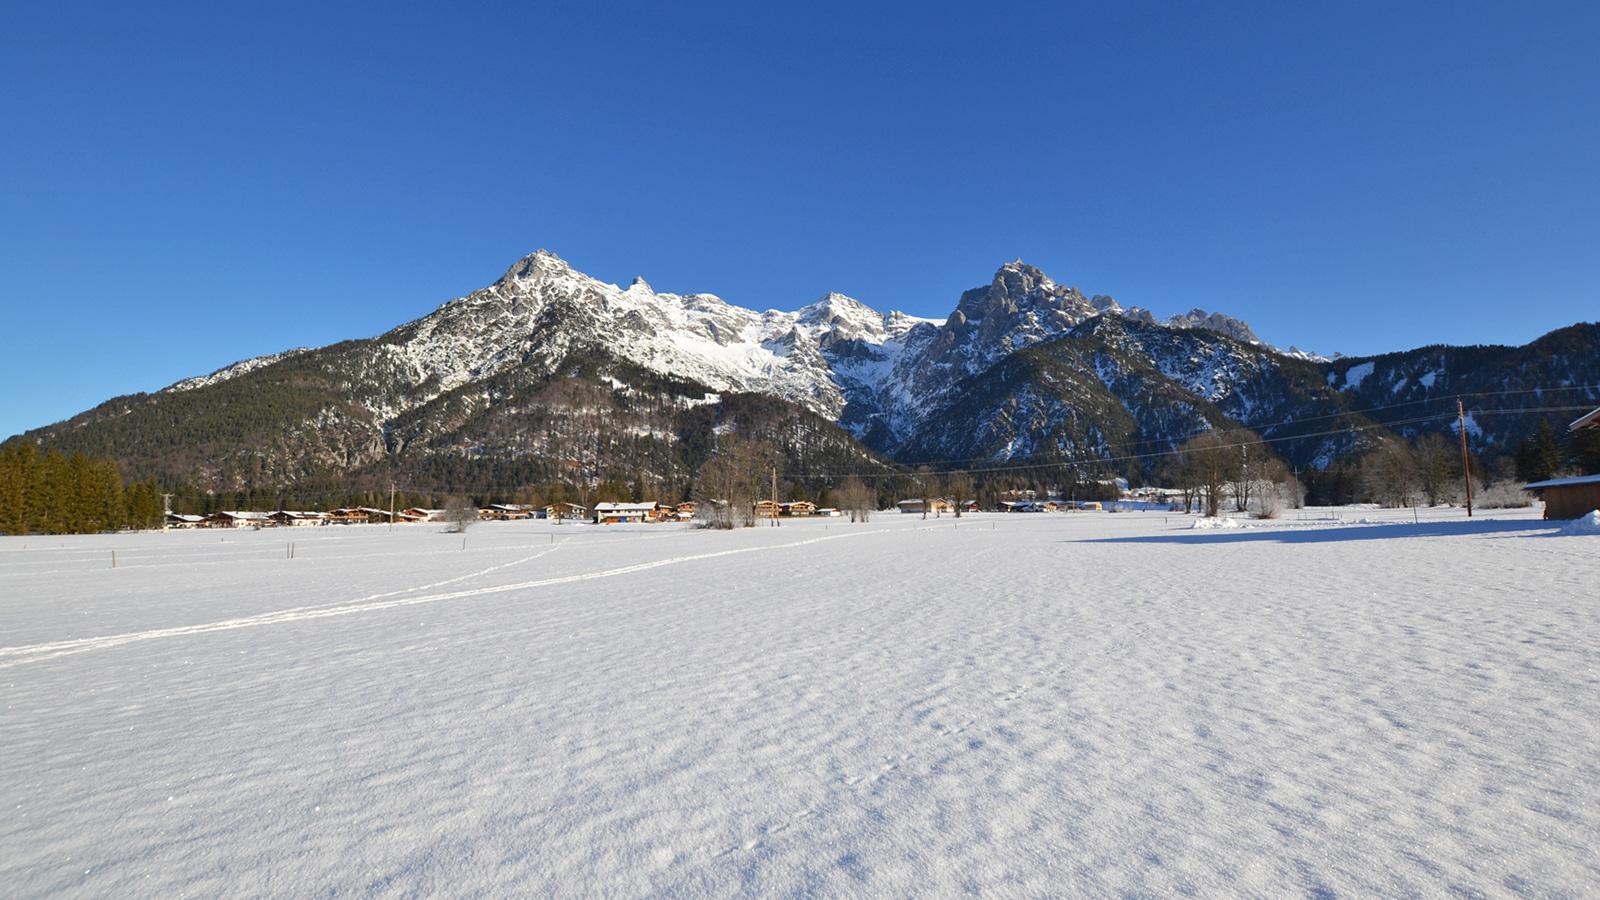 Pillersee Chalets Chalet, Austria